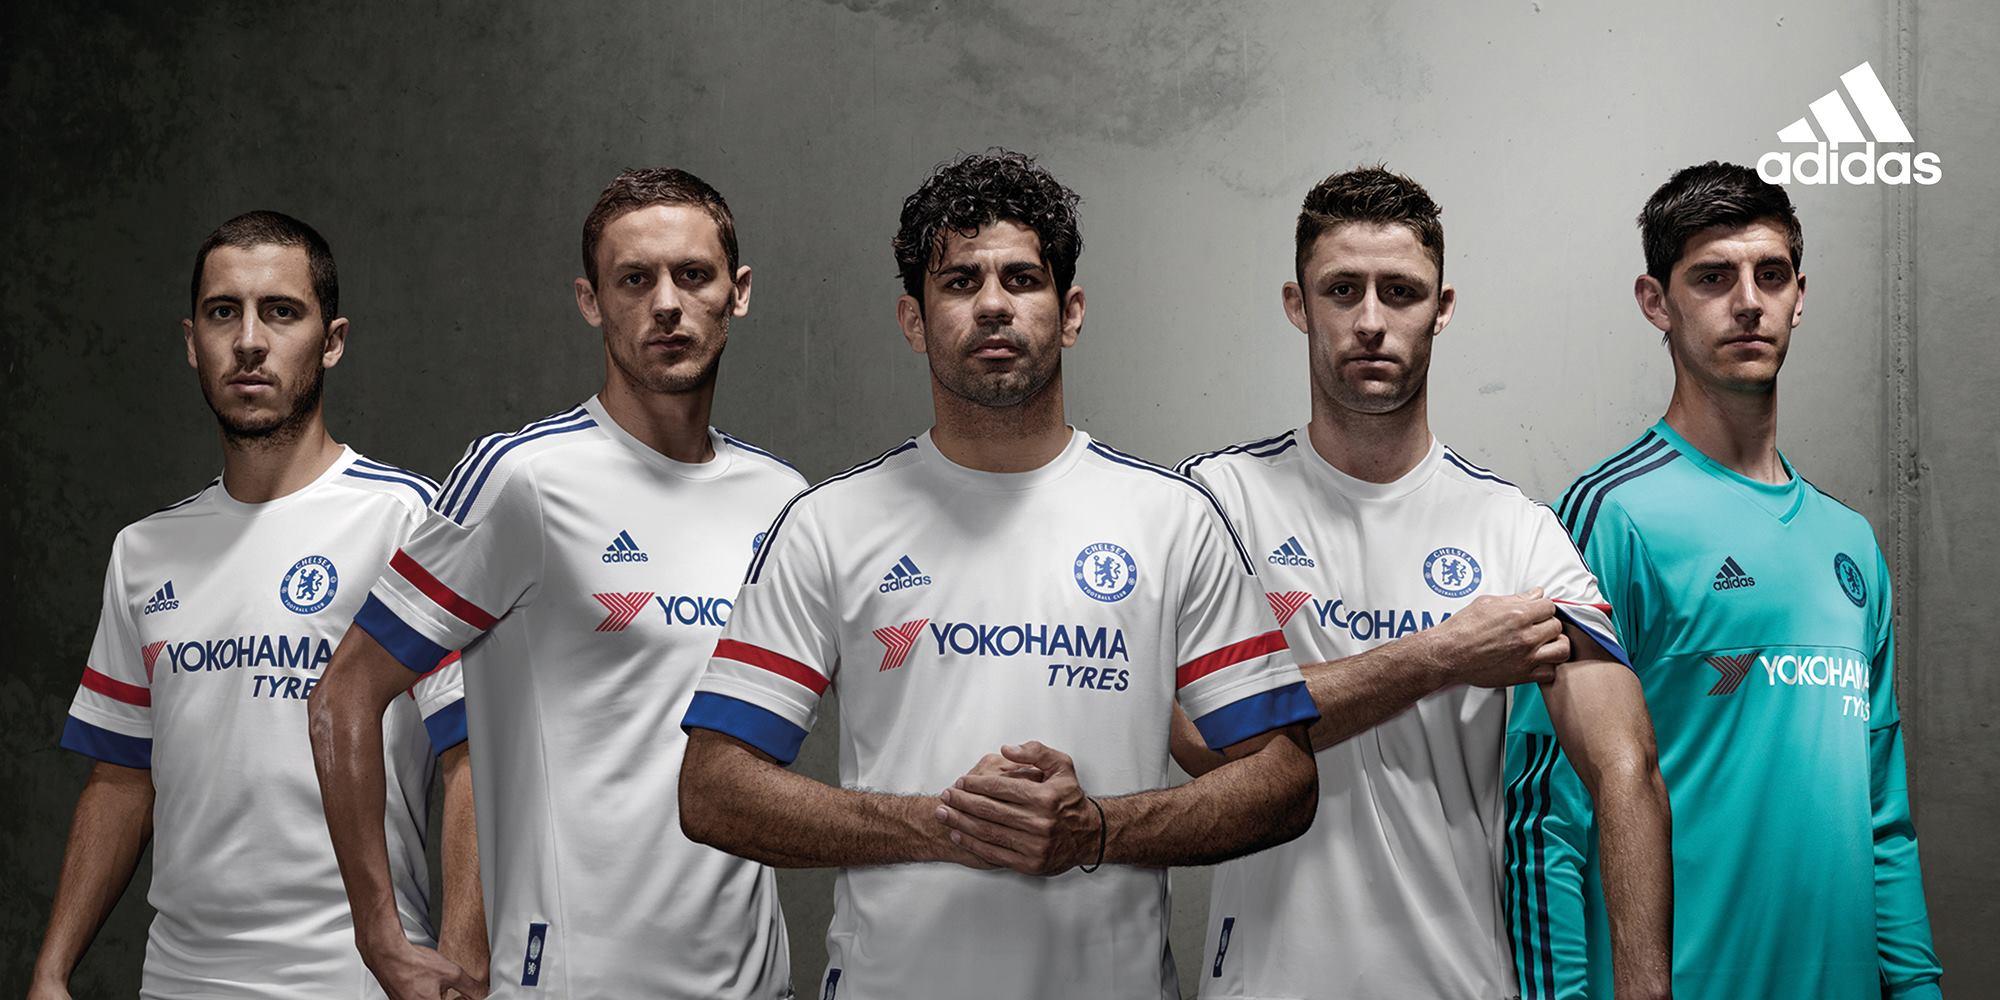 a65d5e7c6f A Premier League está na moda. Confira as camisas da temporada 2015 ...